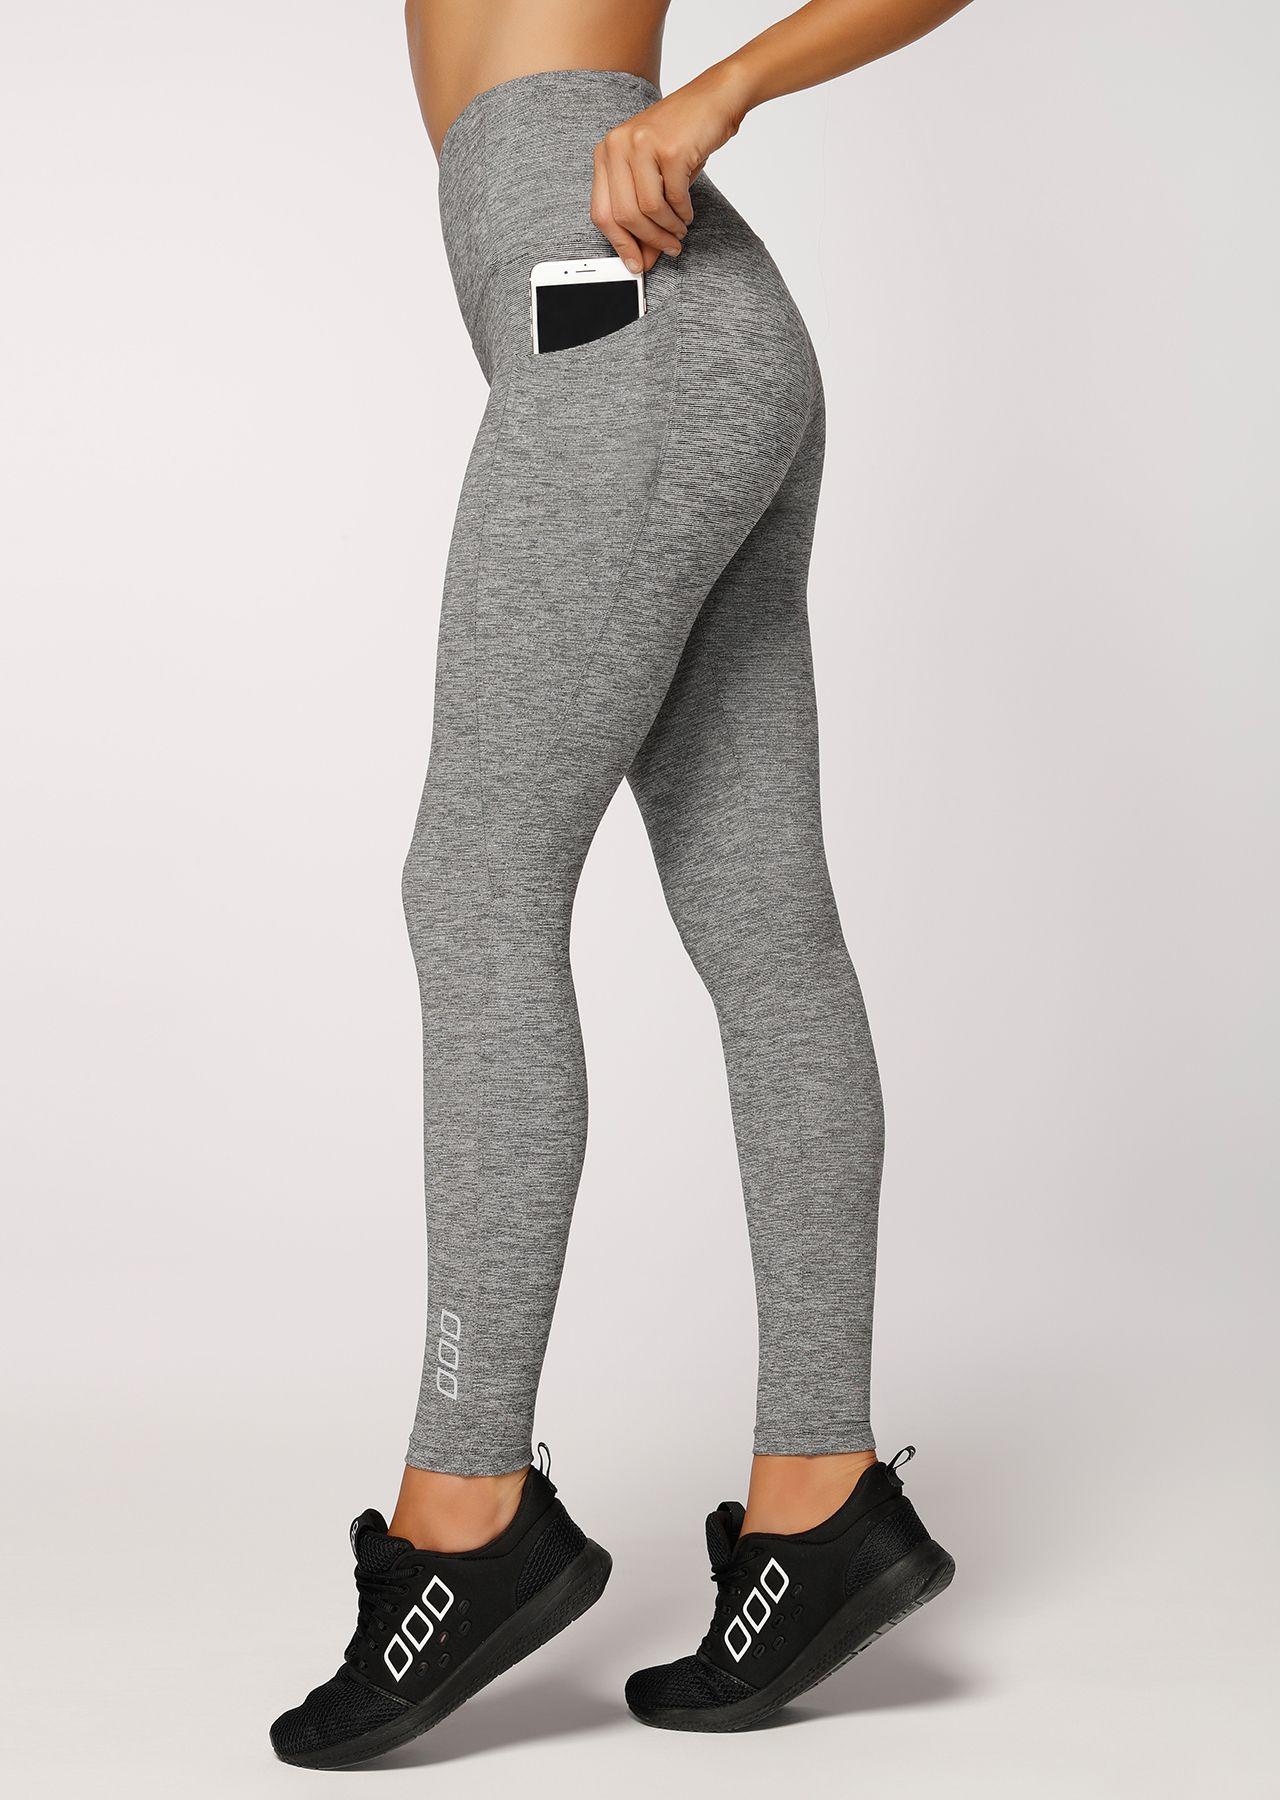 079f7c86643cf5 Women's Sports Leggings, Workout Tights, Exercise Pants | Lorna Jane  Australia